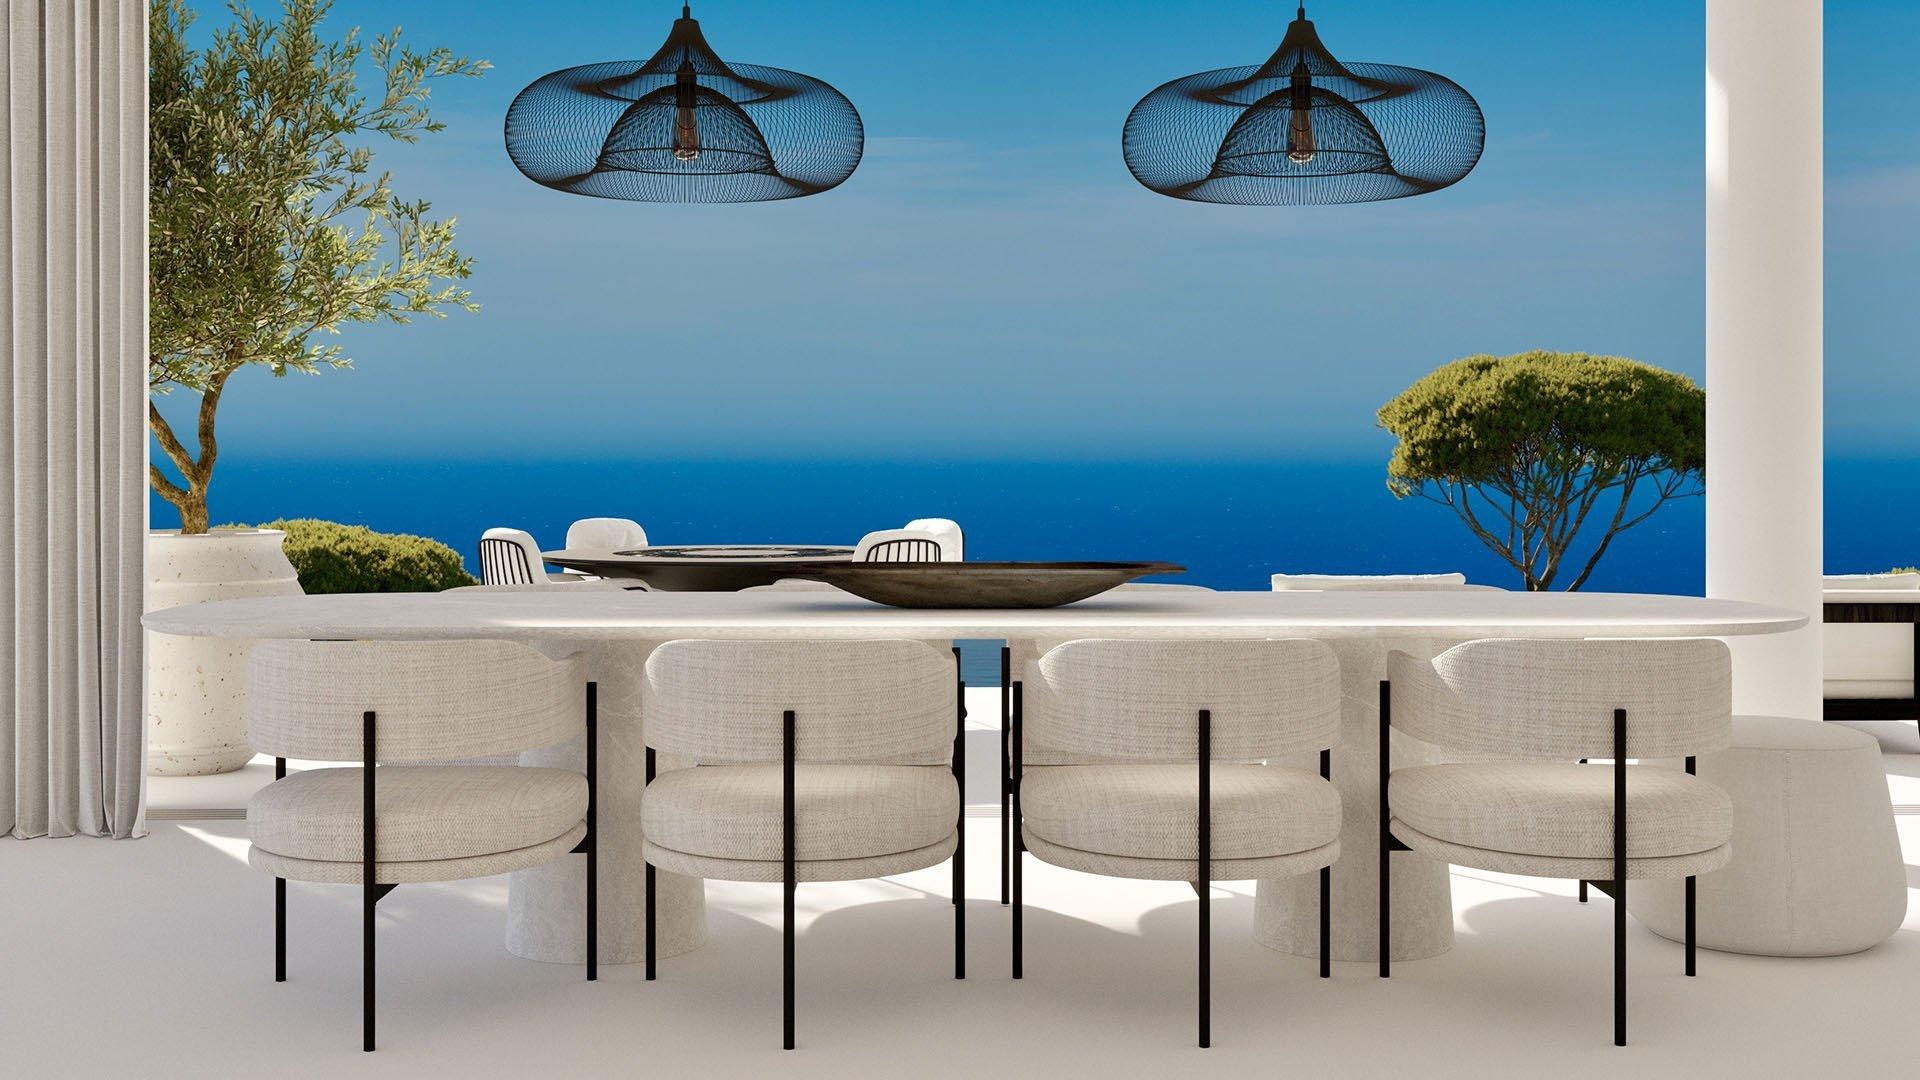 Vista Lago: Impressive designer villas in an exceptional location in Marbella